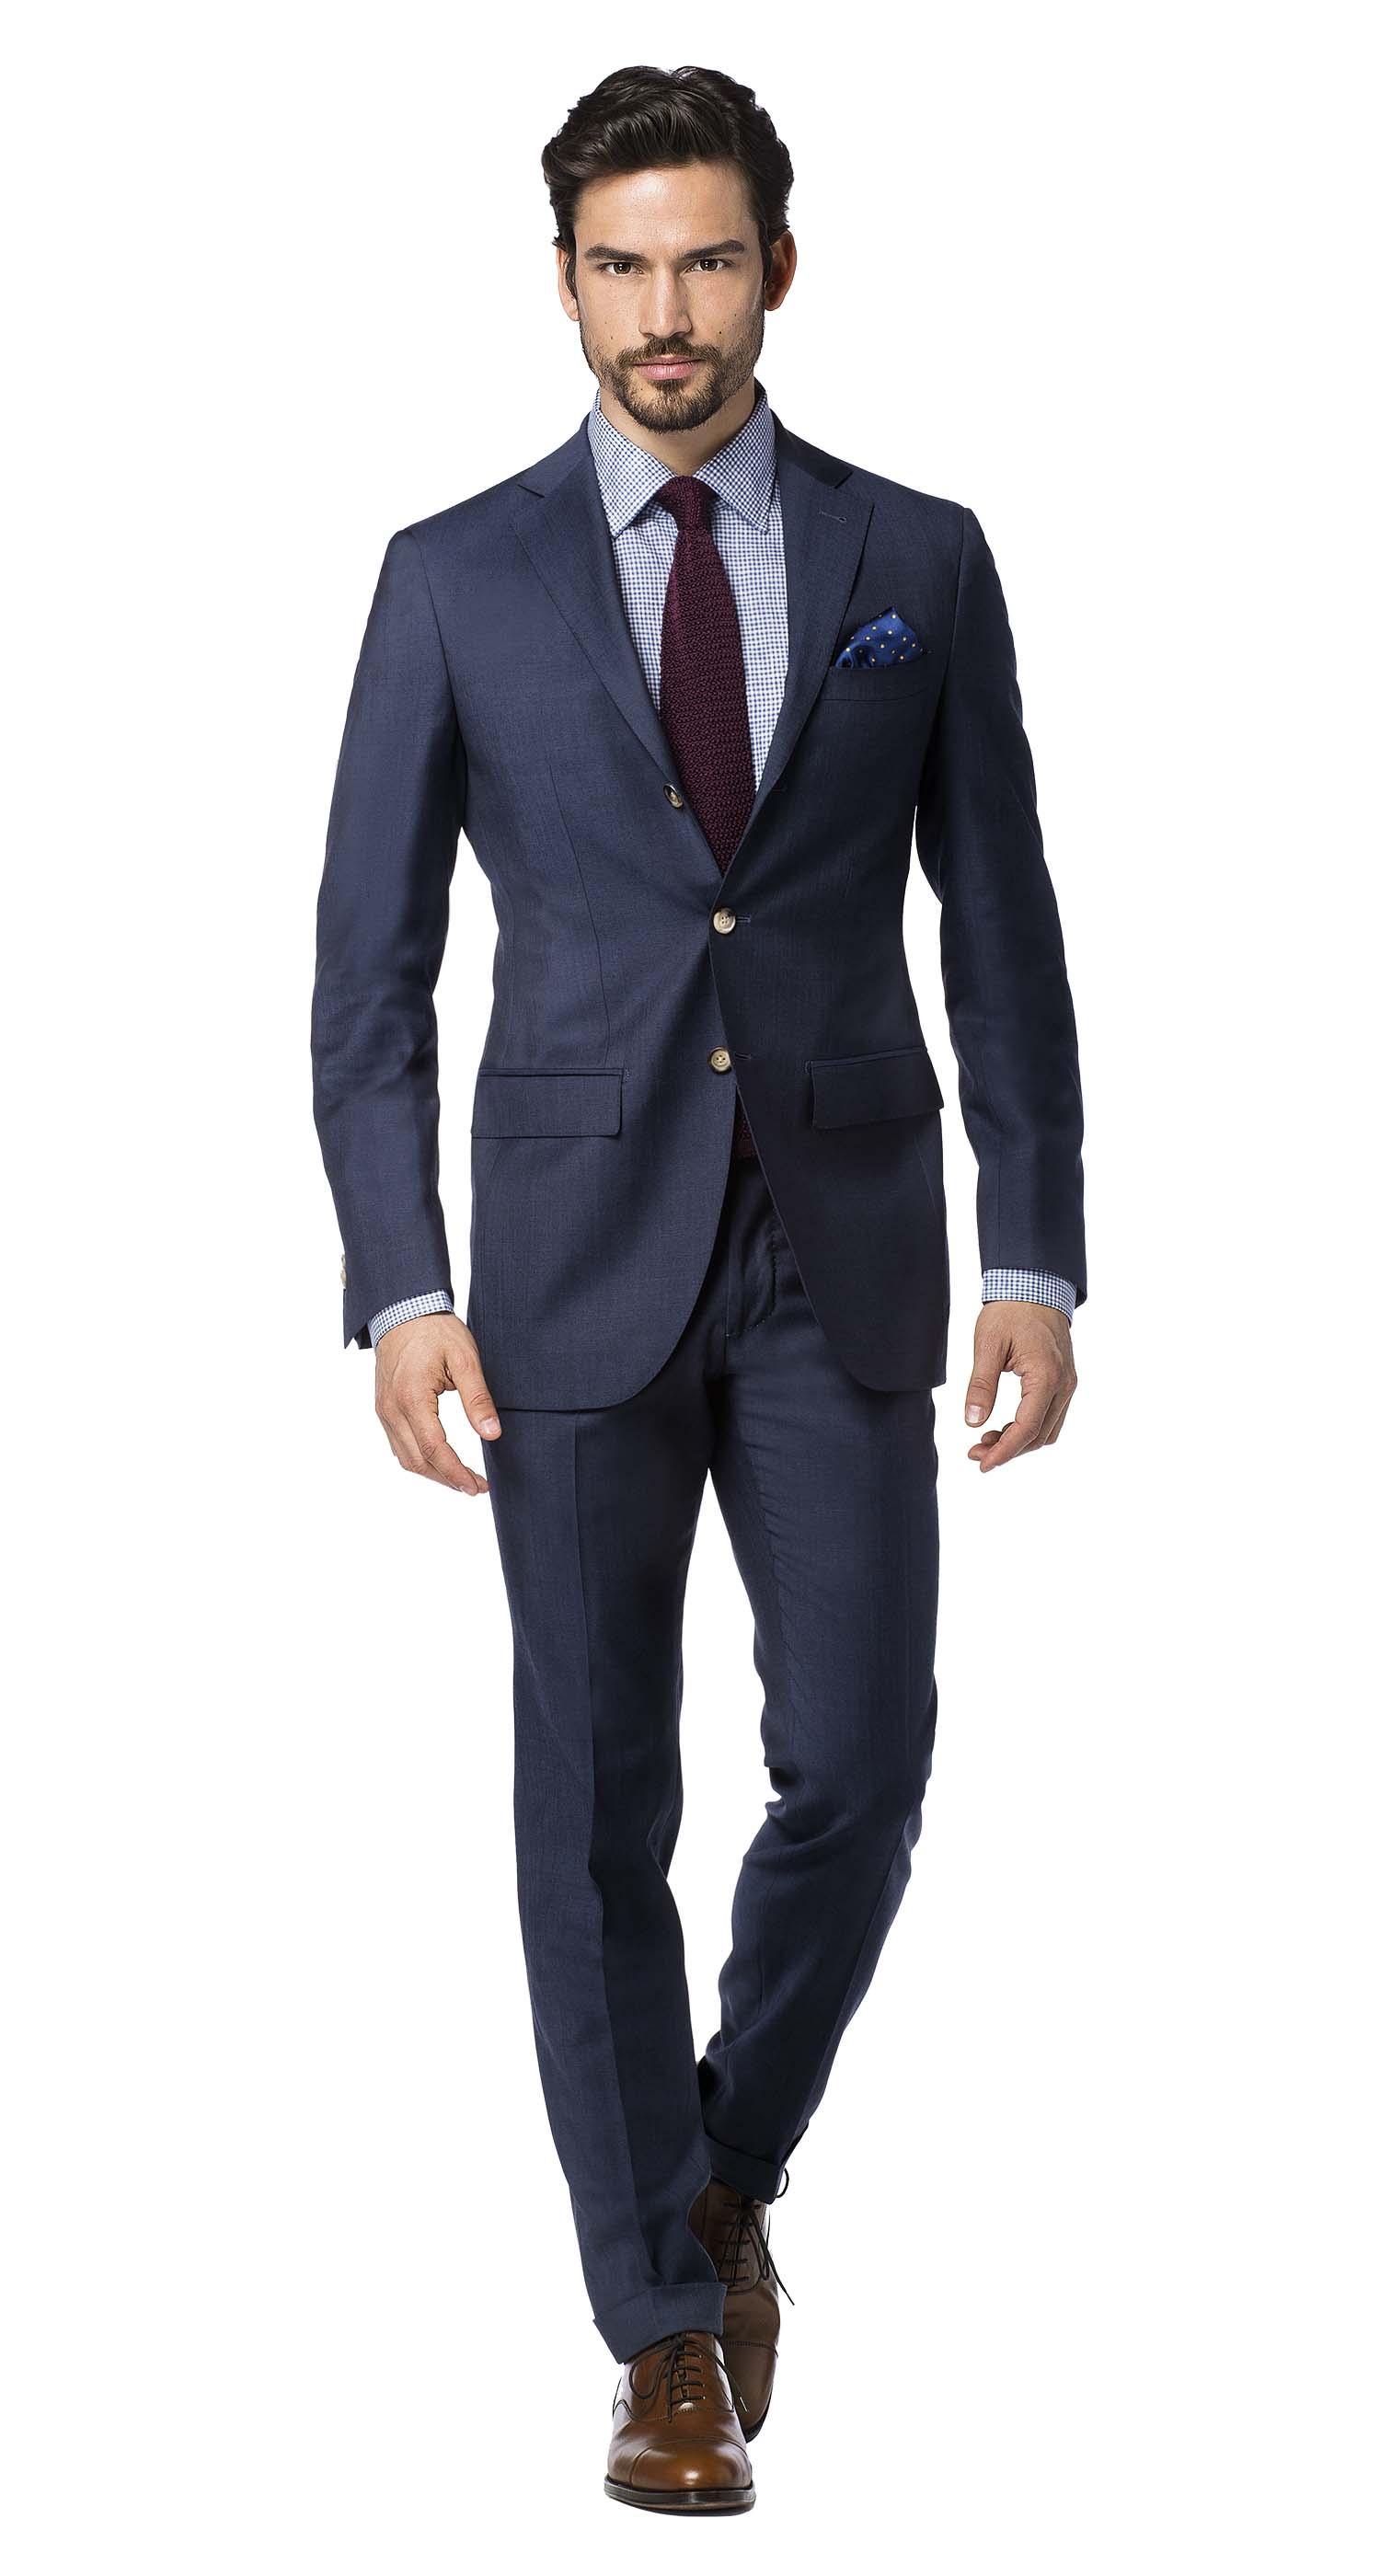 5b50946f342a Uomo indossa un abito metropolitan blu acciaio in fresco lana